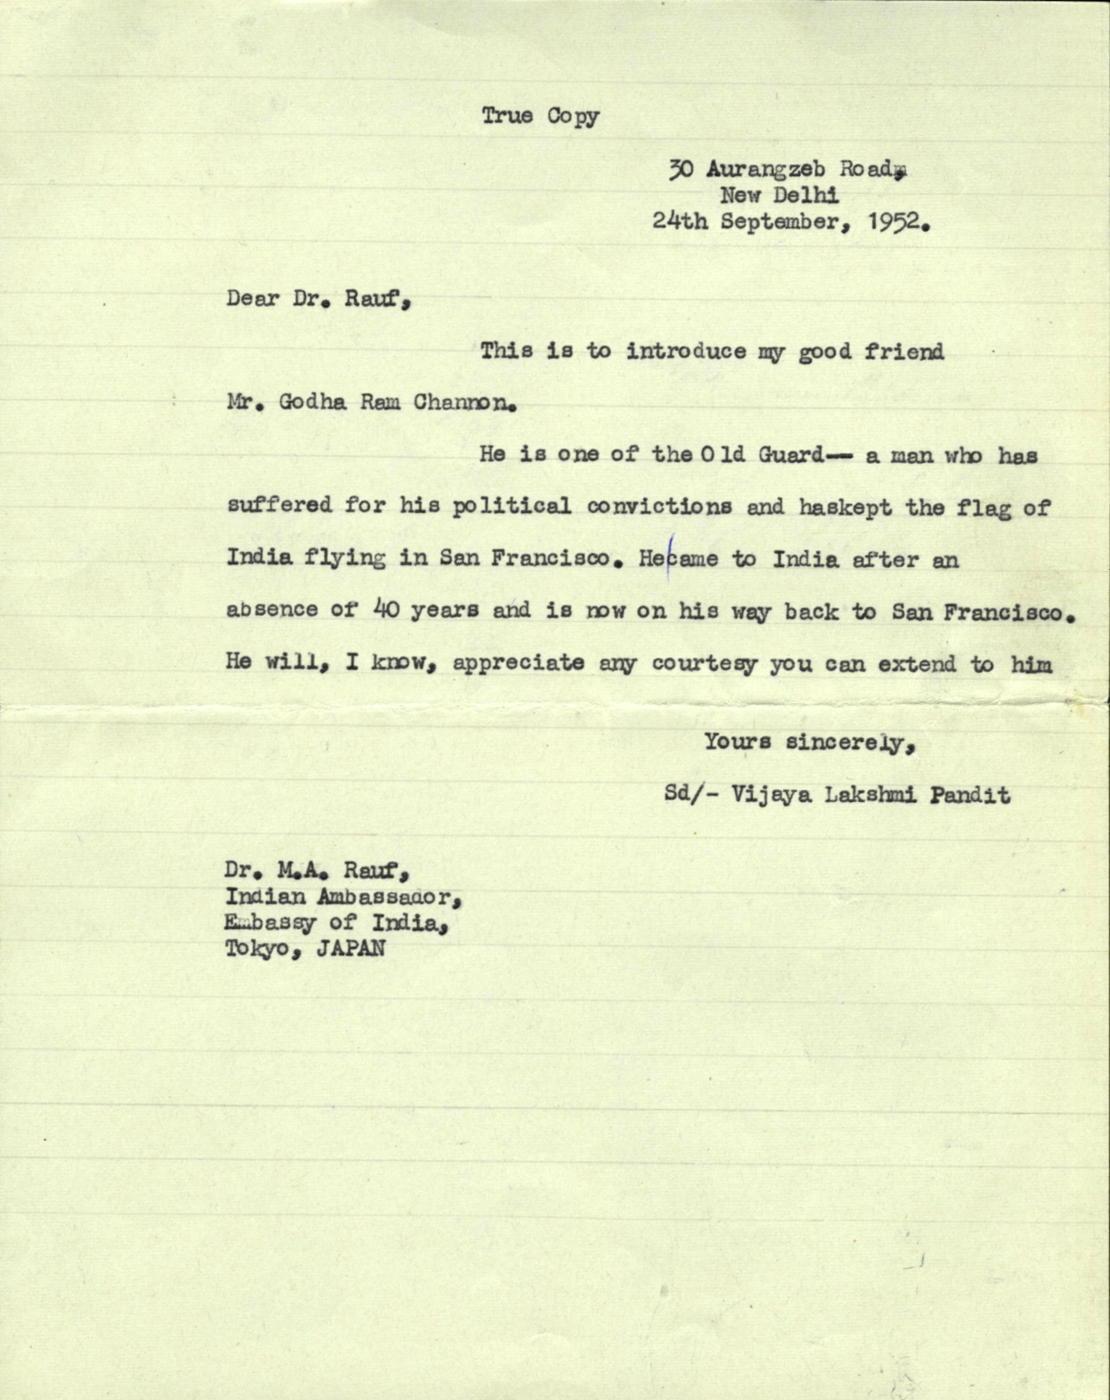 Letter from vijaya lakshmi pandit to ma rauf south asian letter from vijaya lakshmi pandit to ma rauf thecheapjerseys Gallery